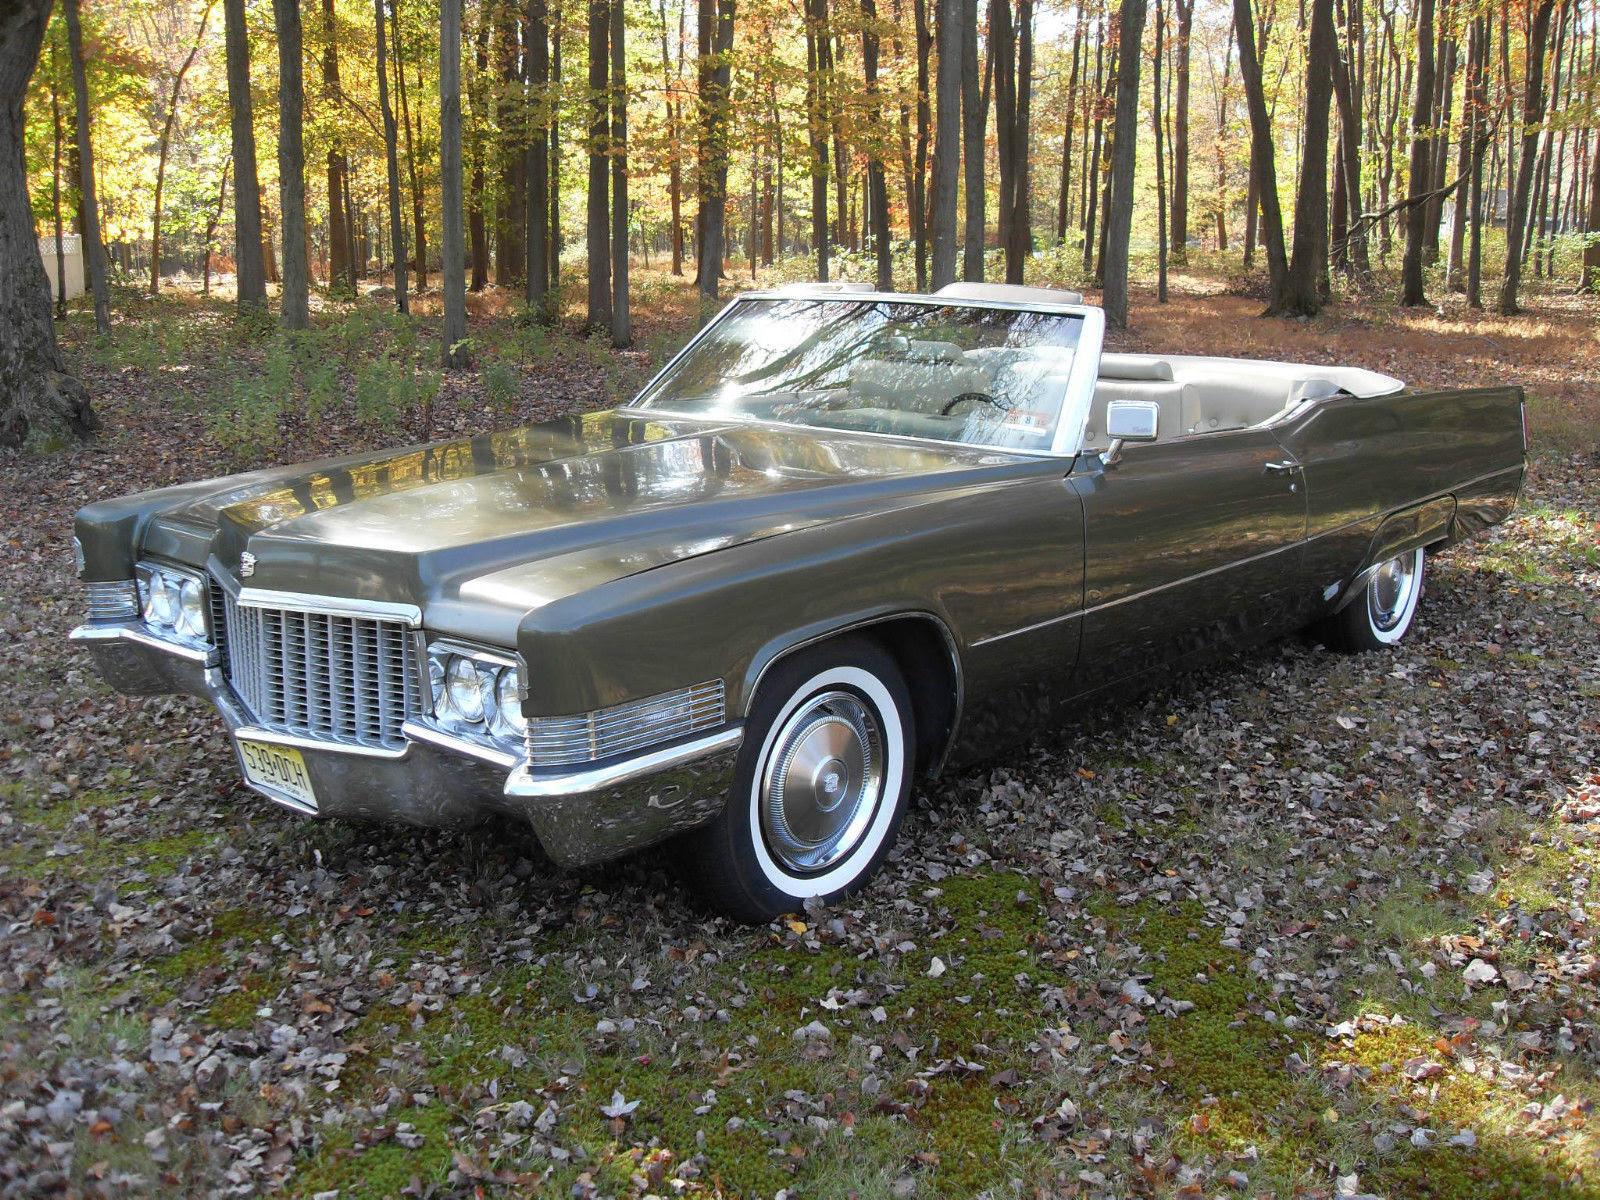 1970 Cadillac DeVille Convertible 65000 miles - low ...